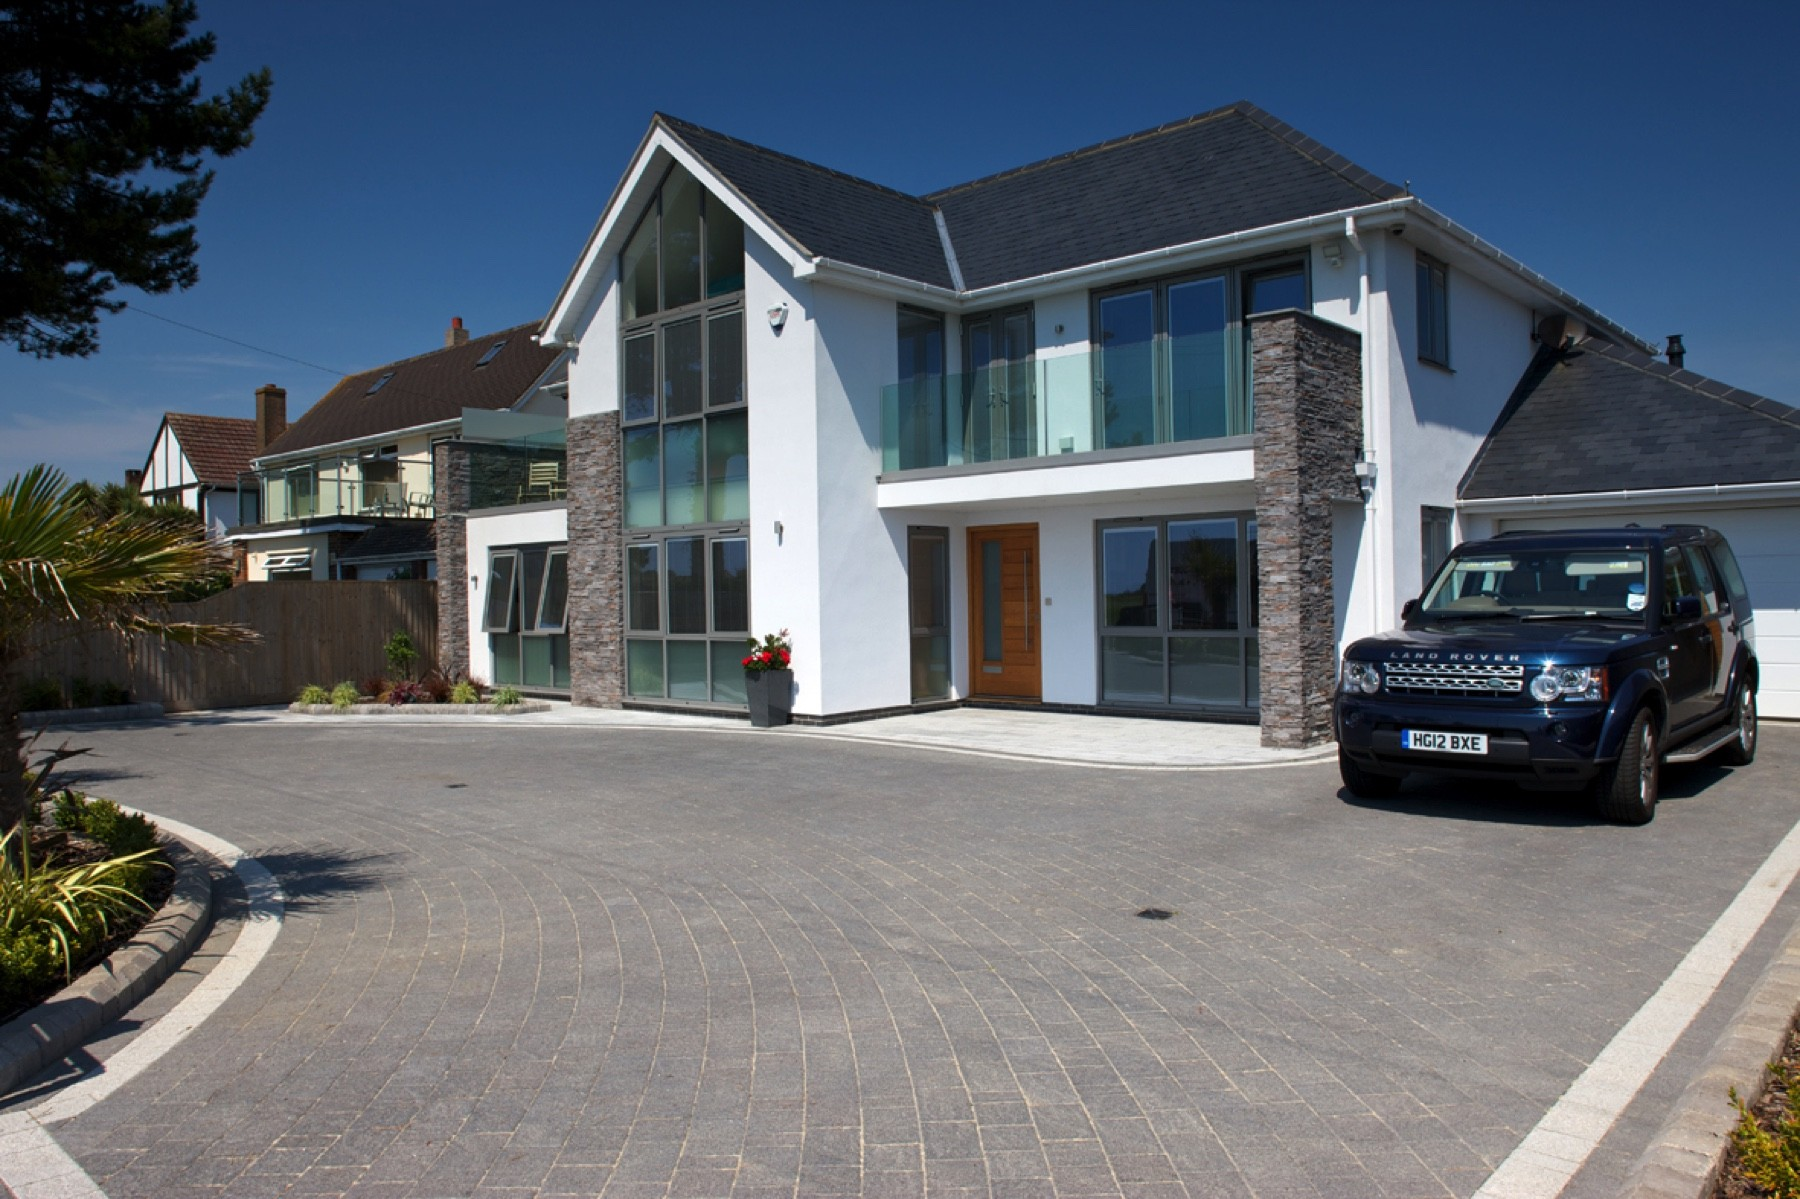 driveway Highcliffe, Marshalls argent driveway, aura landscapes, award winning driveway, quality driveway, grey paviour driveway, driveway by Aura Landscapes